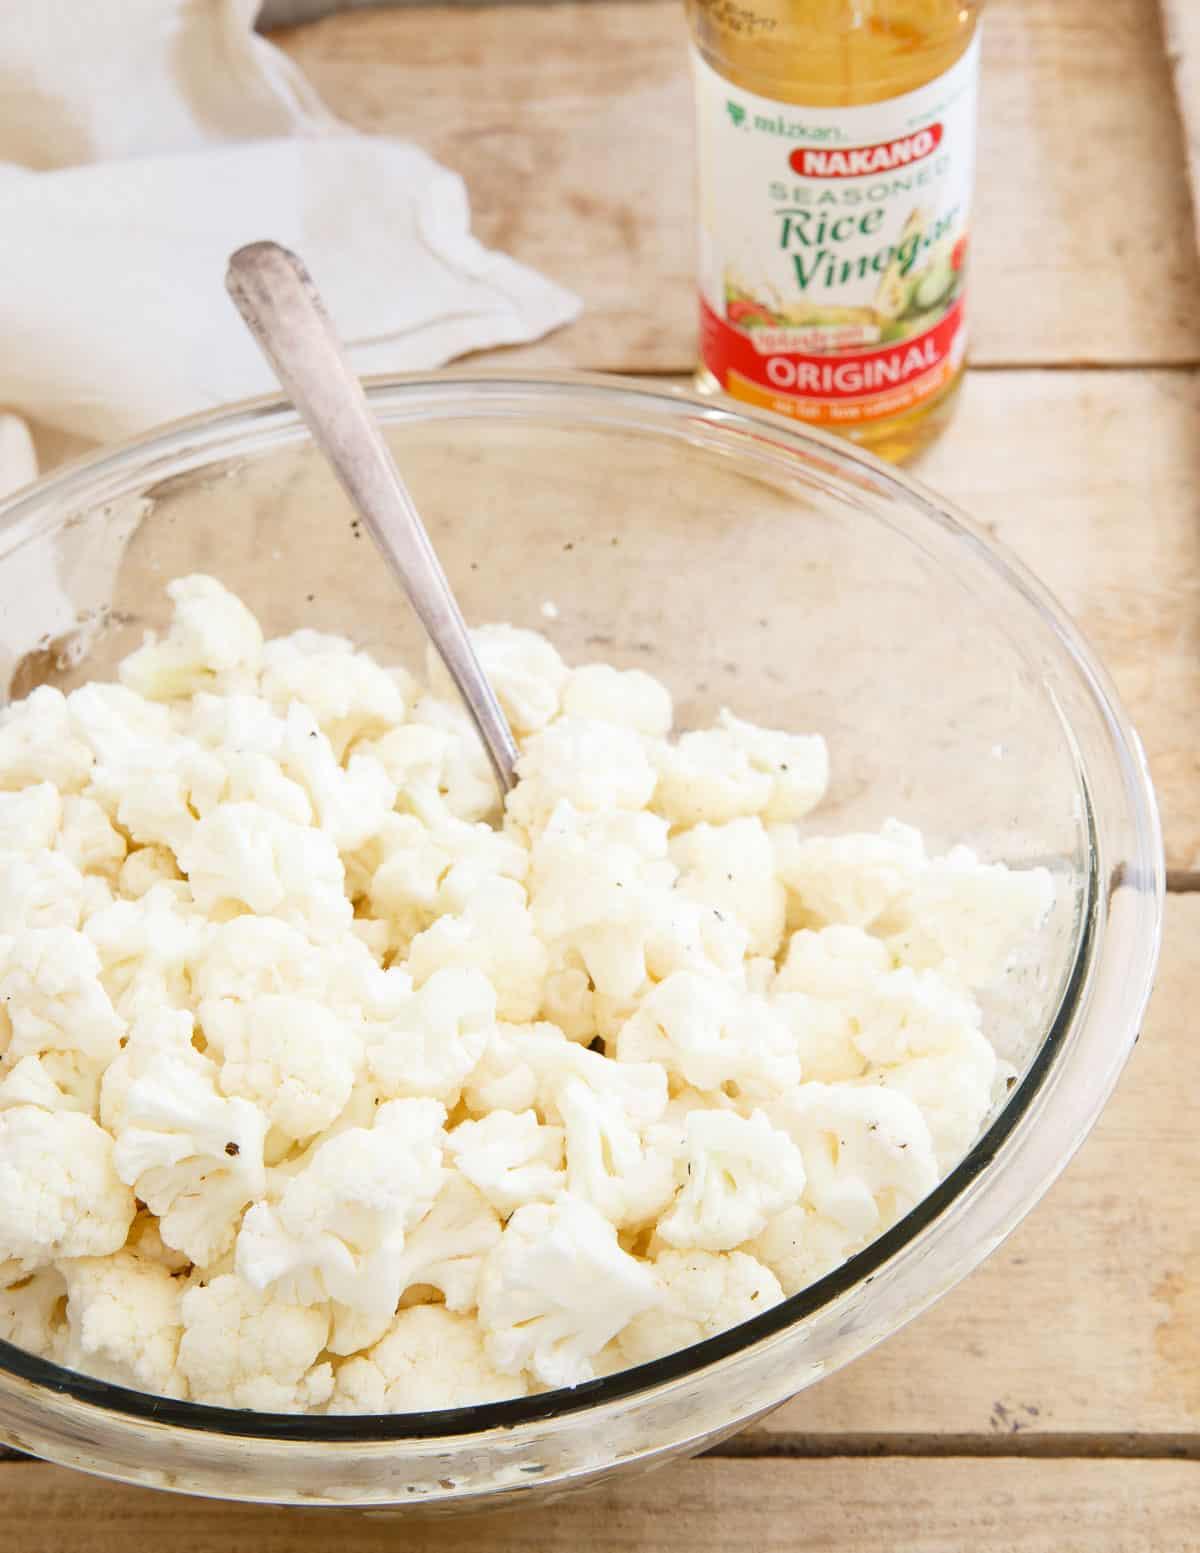 Salt and Vinegar Popcorn Cauliflower using Nakano Original rice vinegar.